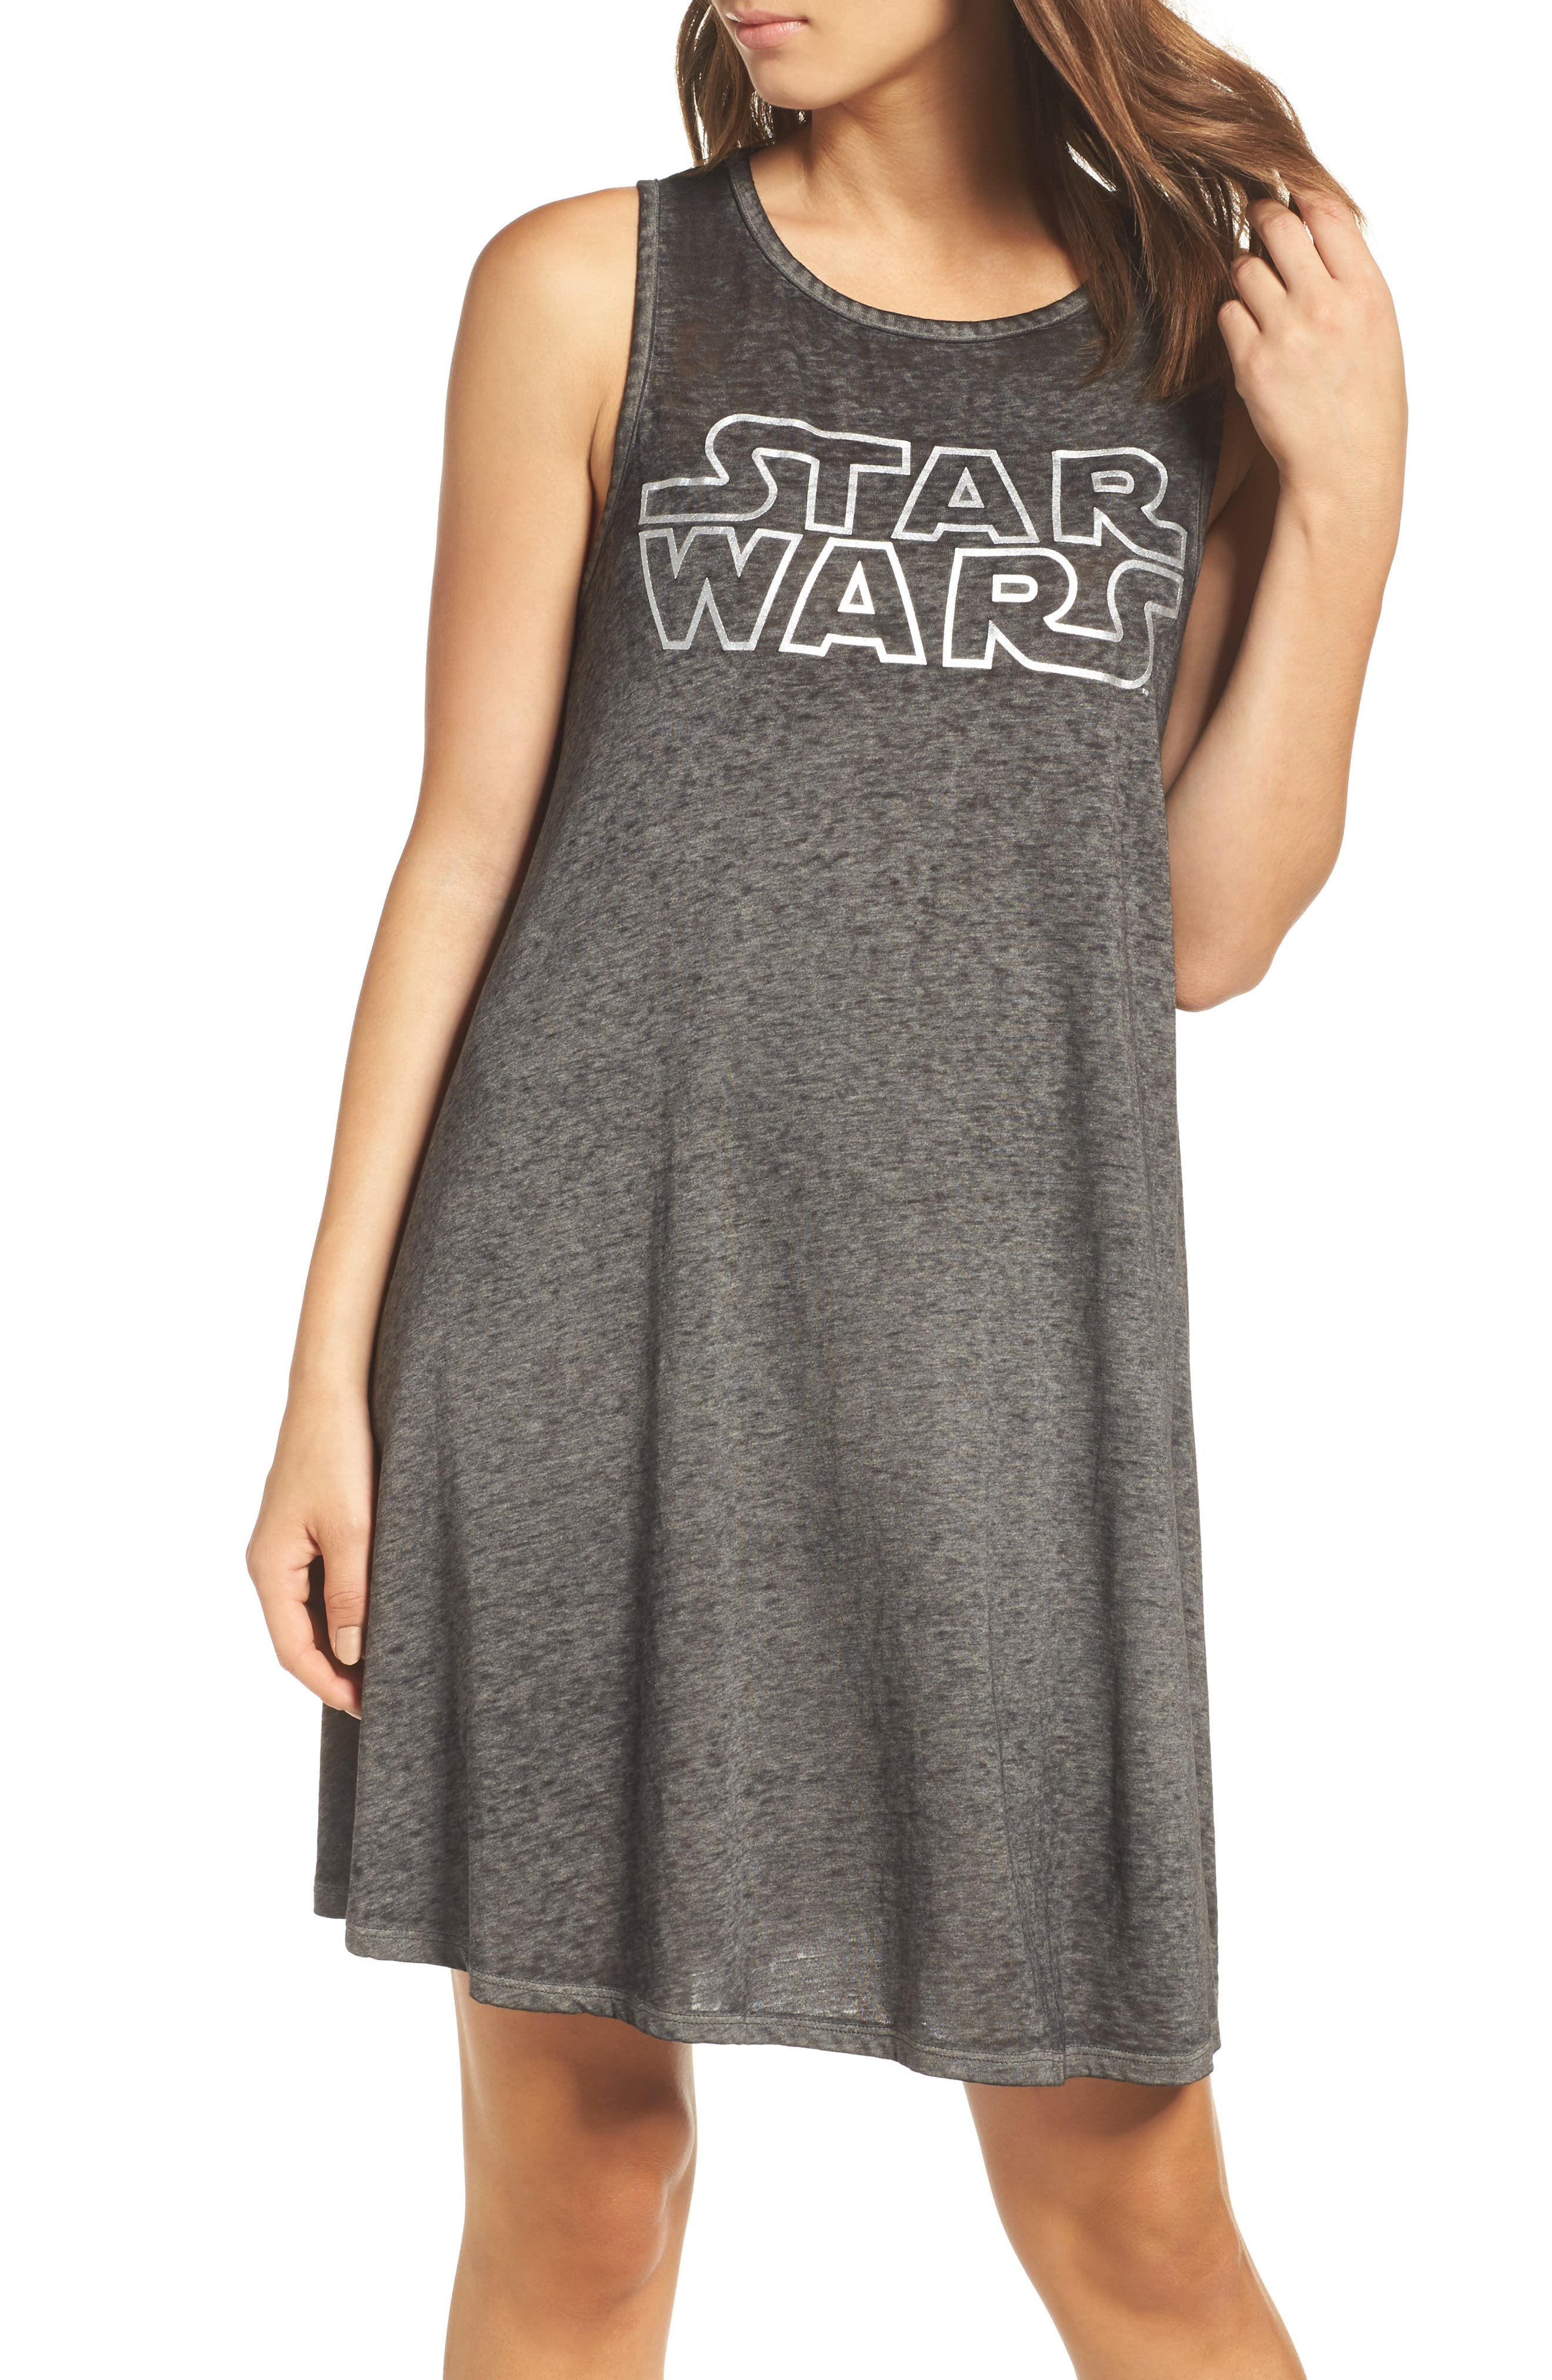 Main Image - Retrospective Co. Star Wars™ Graphic Short Nightgown